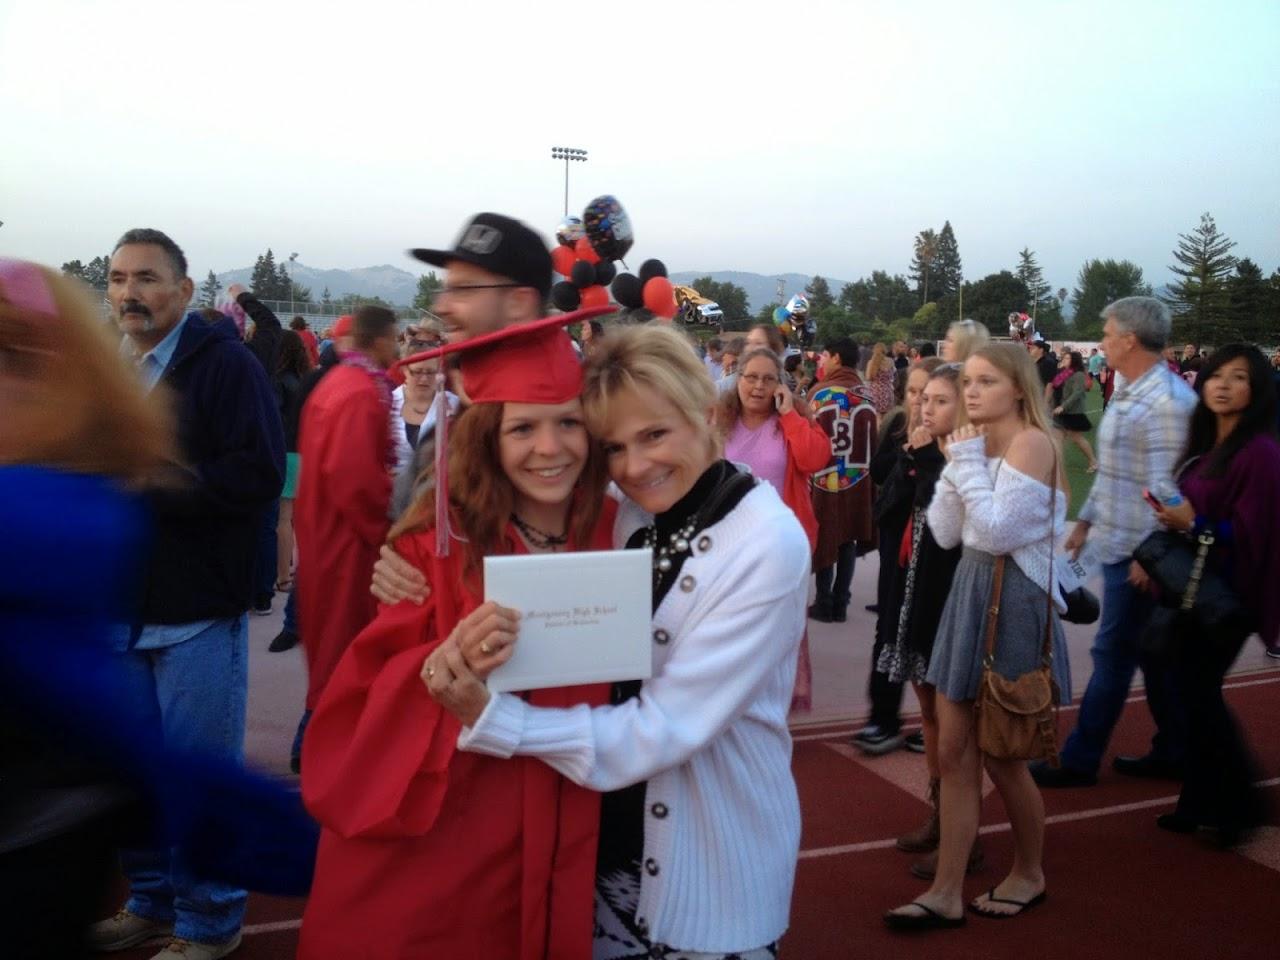 Courtney and Aunt Kim